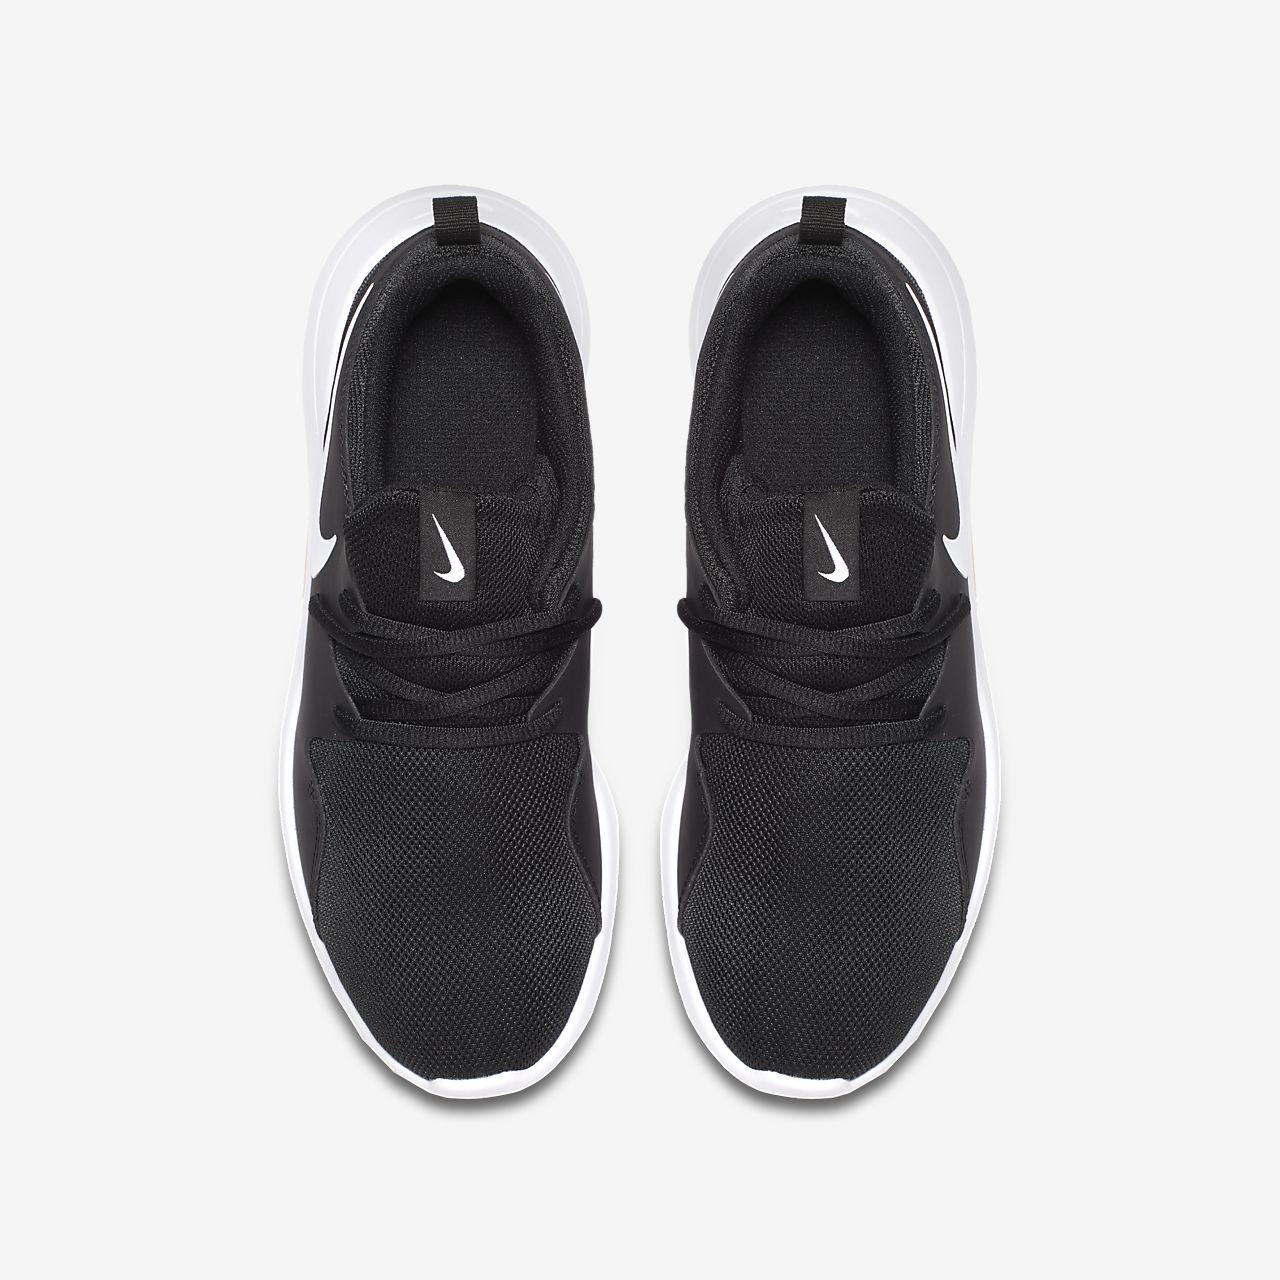 895e5c86399 Nike Tessen Older Kids  Shoe. Nike.com IE